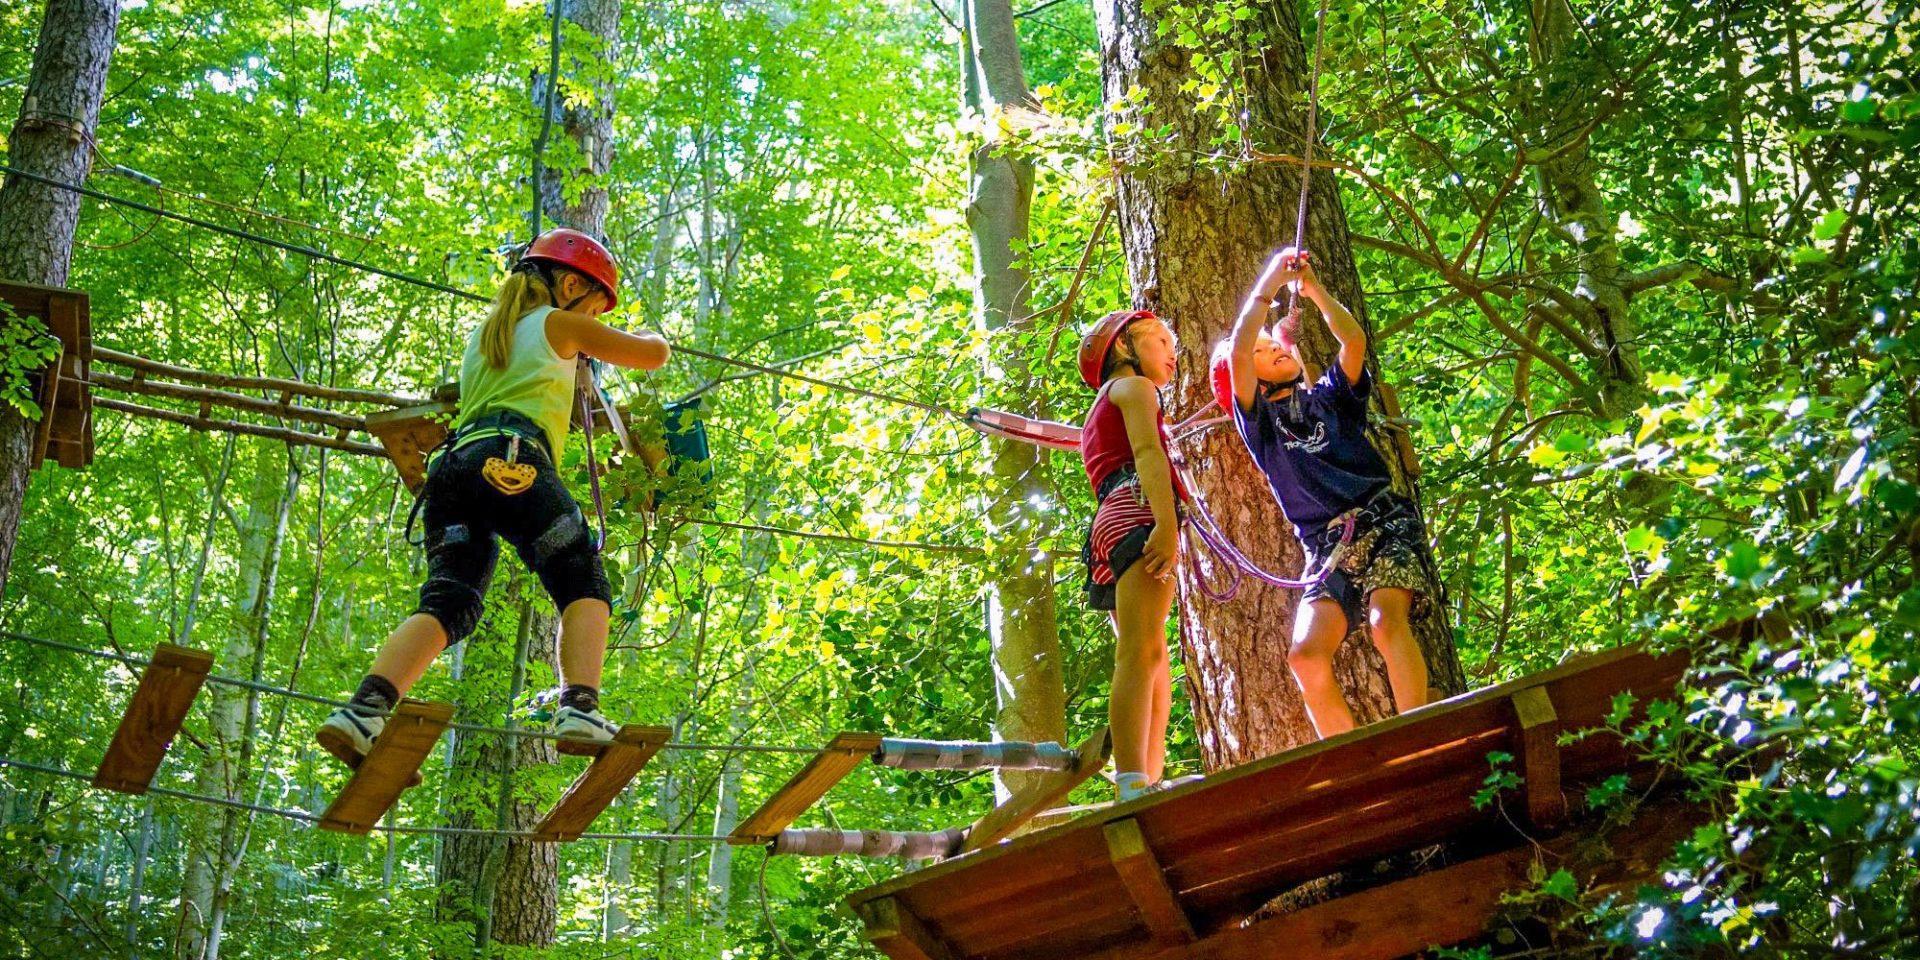 Foret de Vizzavona Corsica Frankrijk accrobrache boomkruinenpad kids outdoor sportief